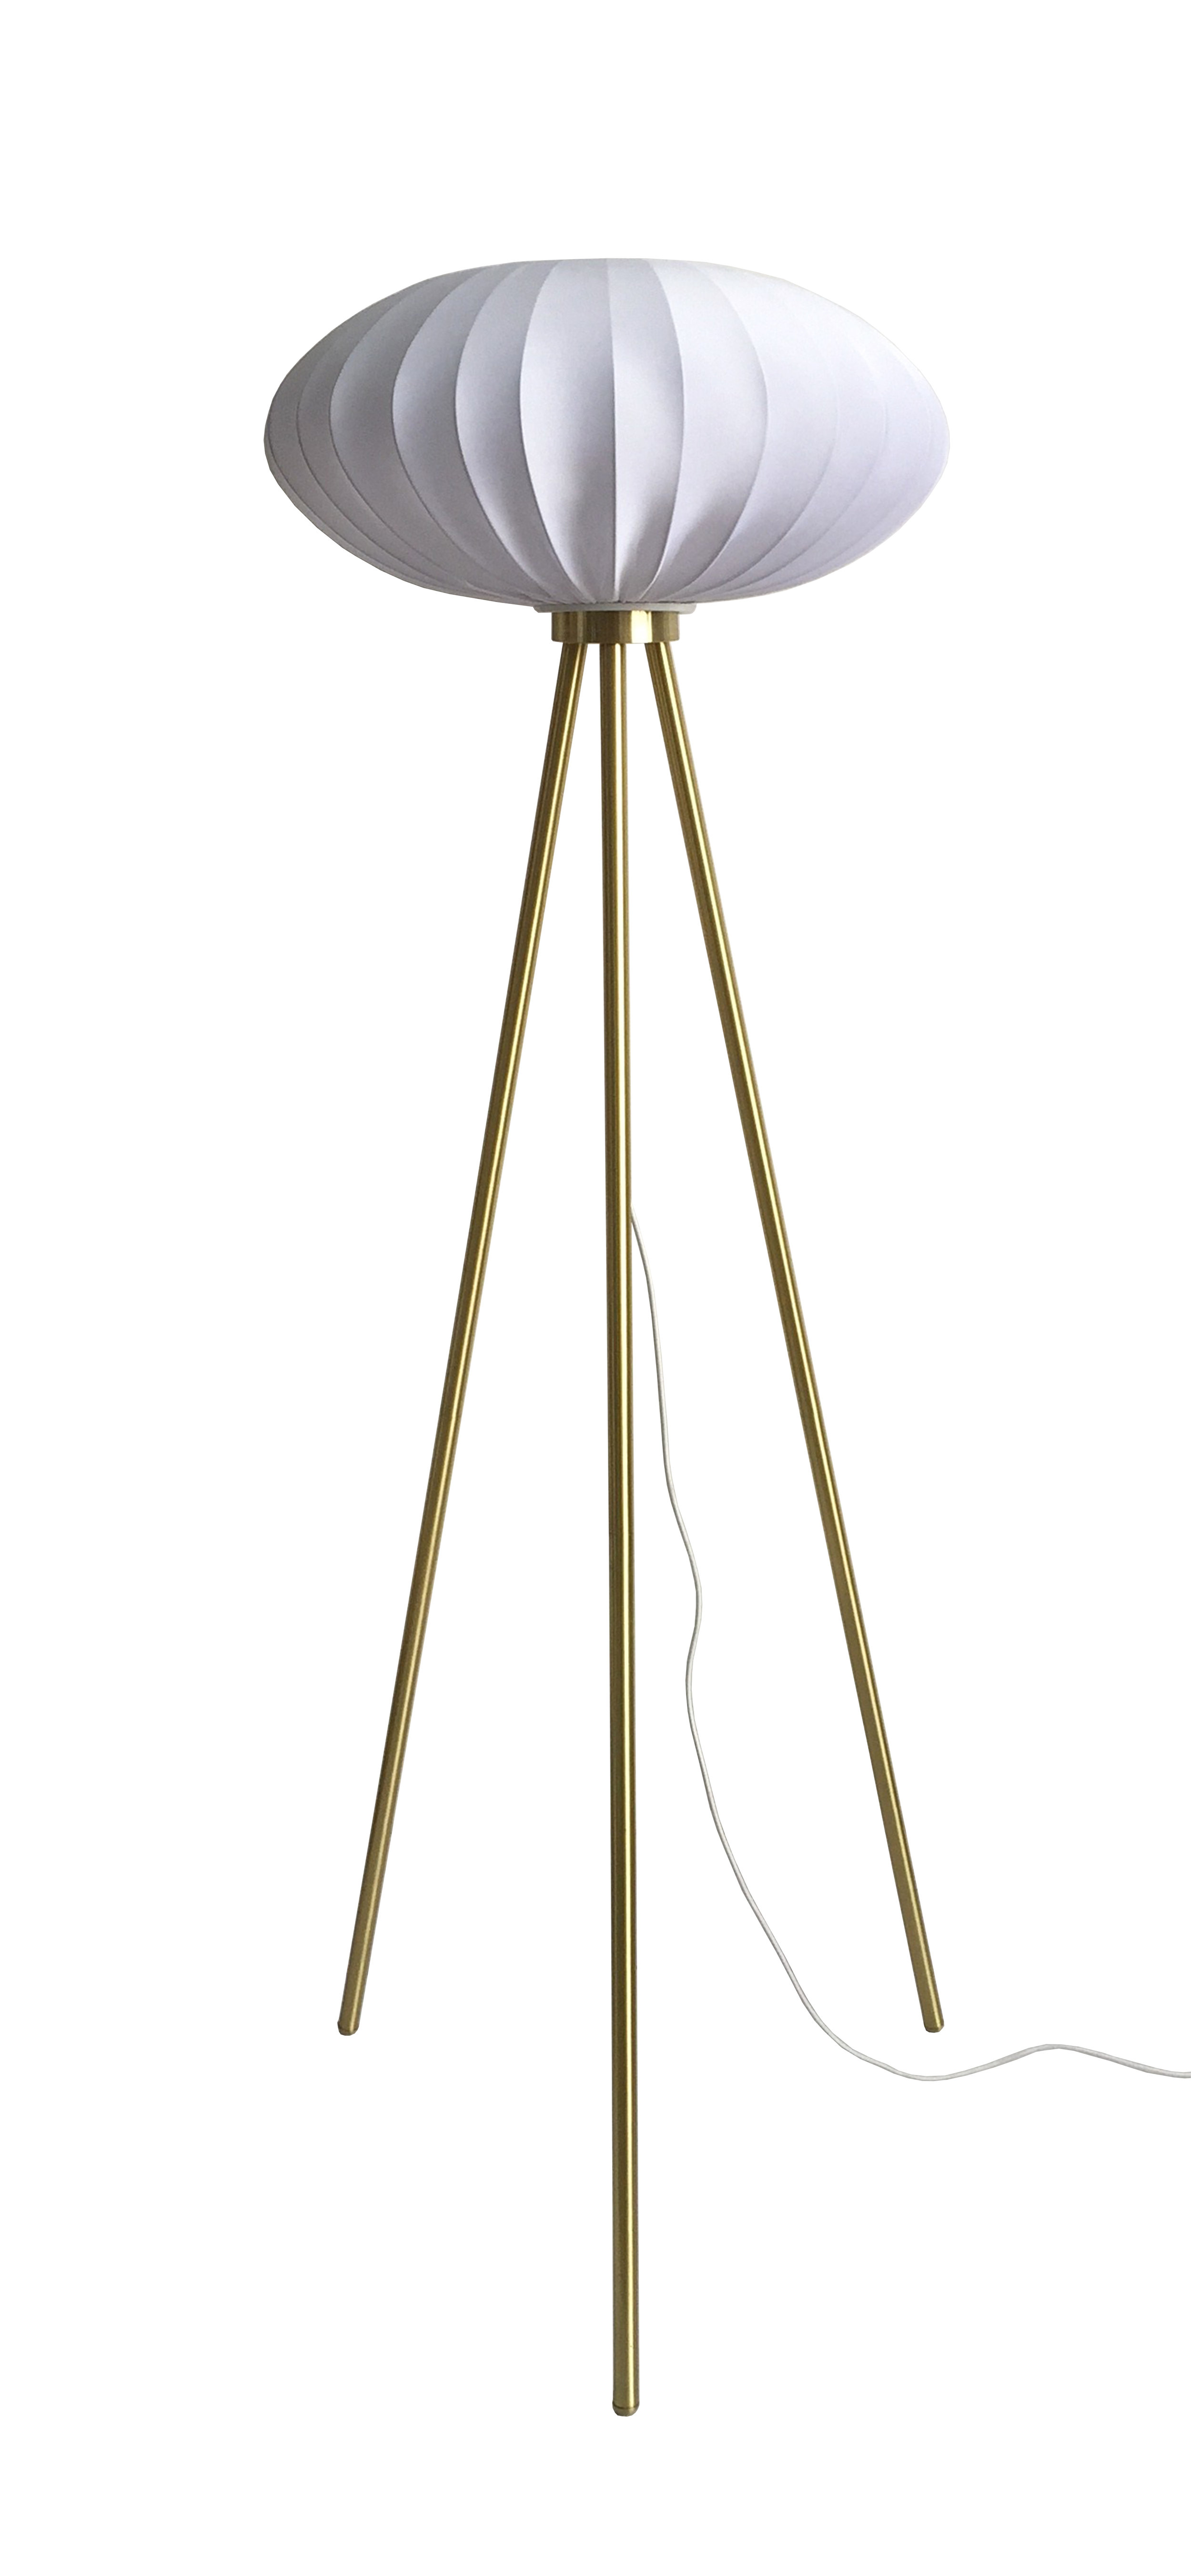 30003661_02_Coral-Tripod-Floor-Lamp.jpg